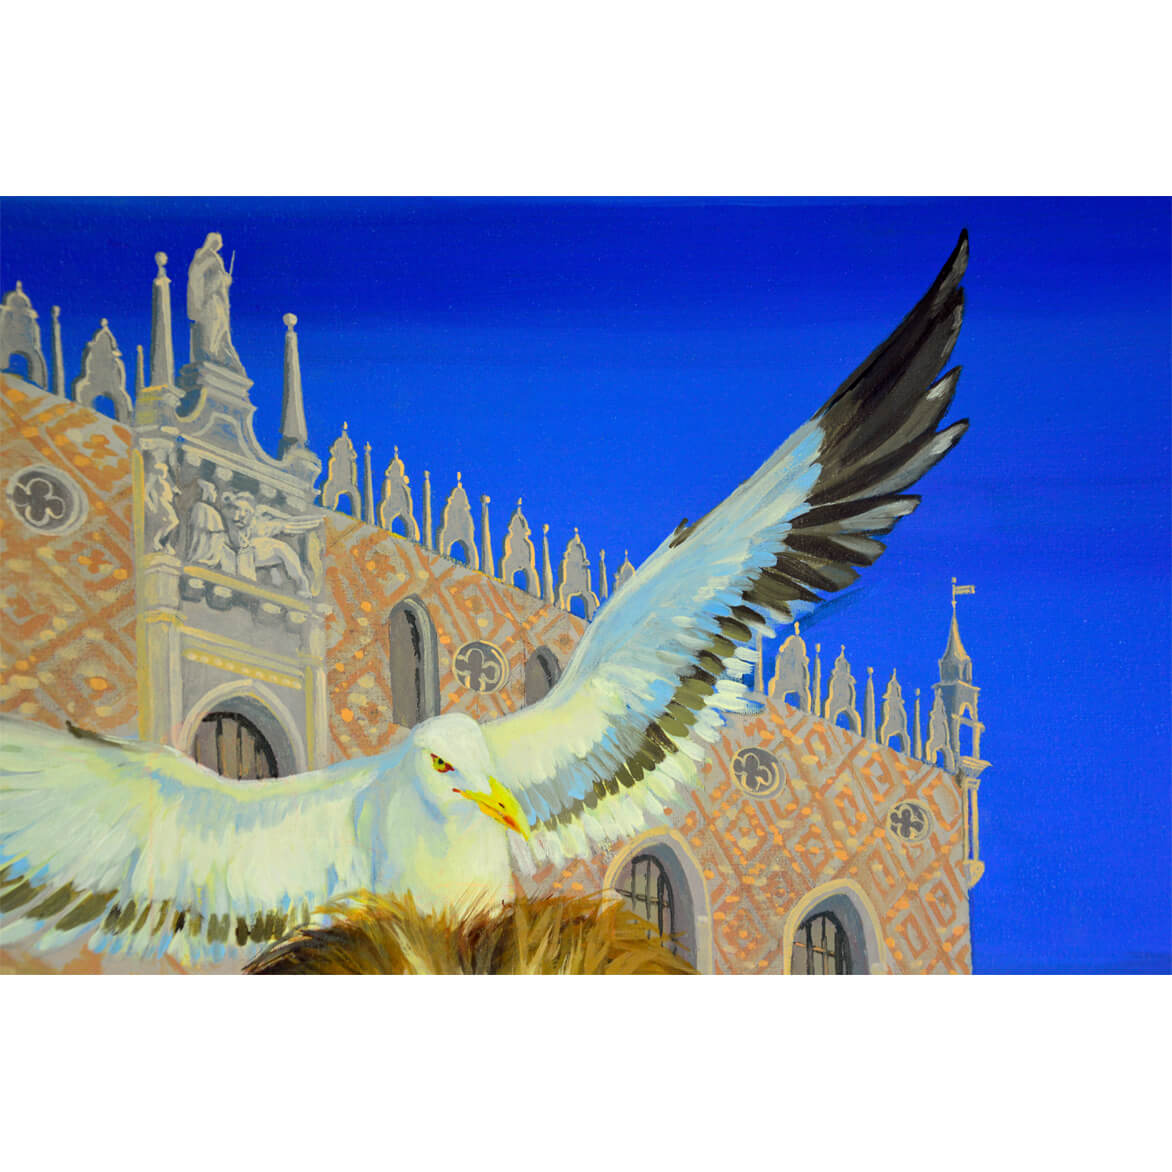 Herring gull painting with Venetian background